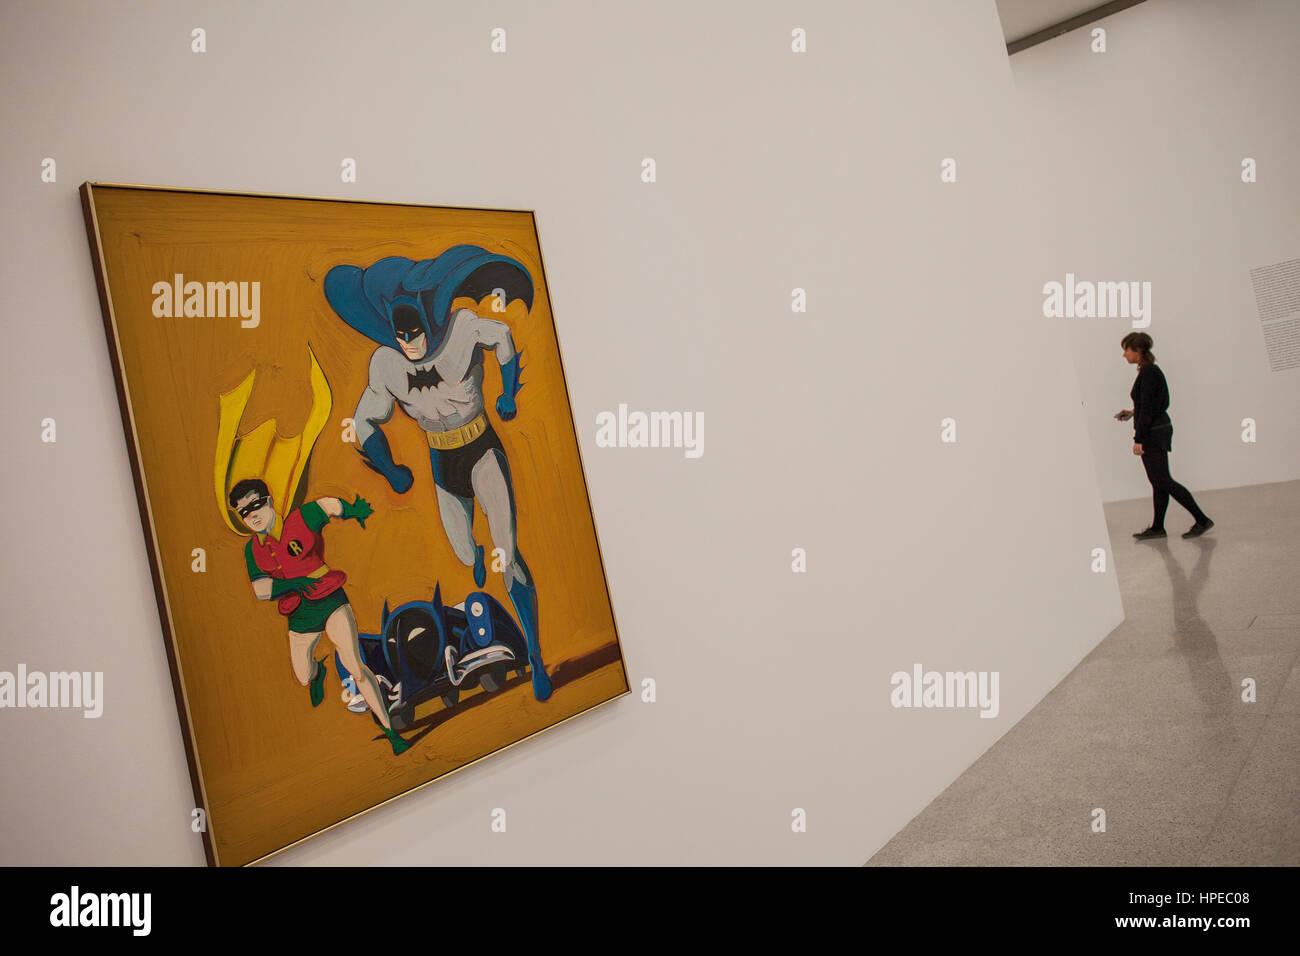 Batmobile by Mel Ramos, Museum Moderner Kunst, MUMOK, Museum of Modern Art, MuseumsQuartier, Vienna, Austria, Europe - Stock Image